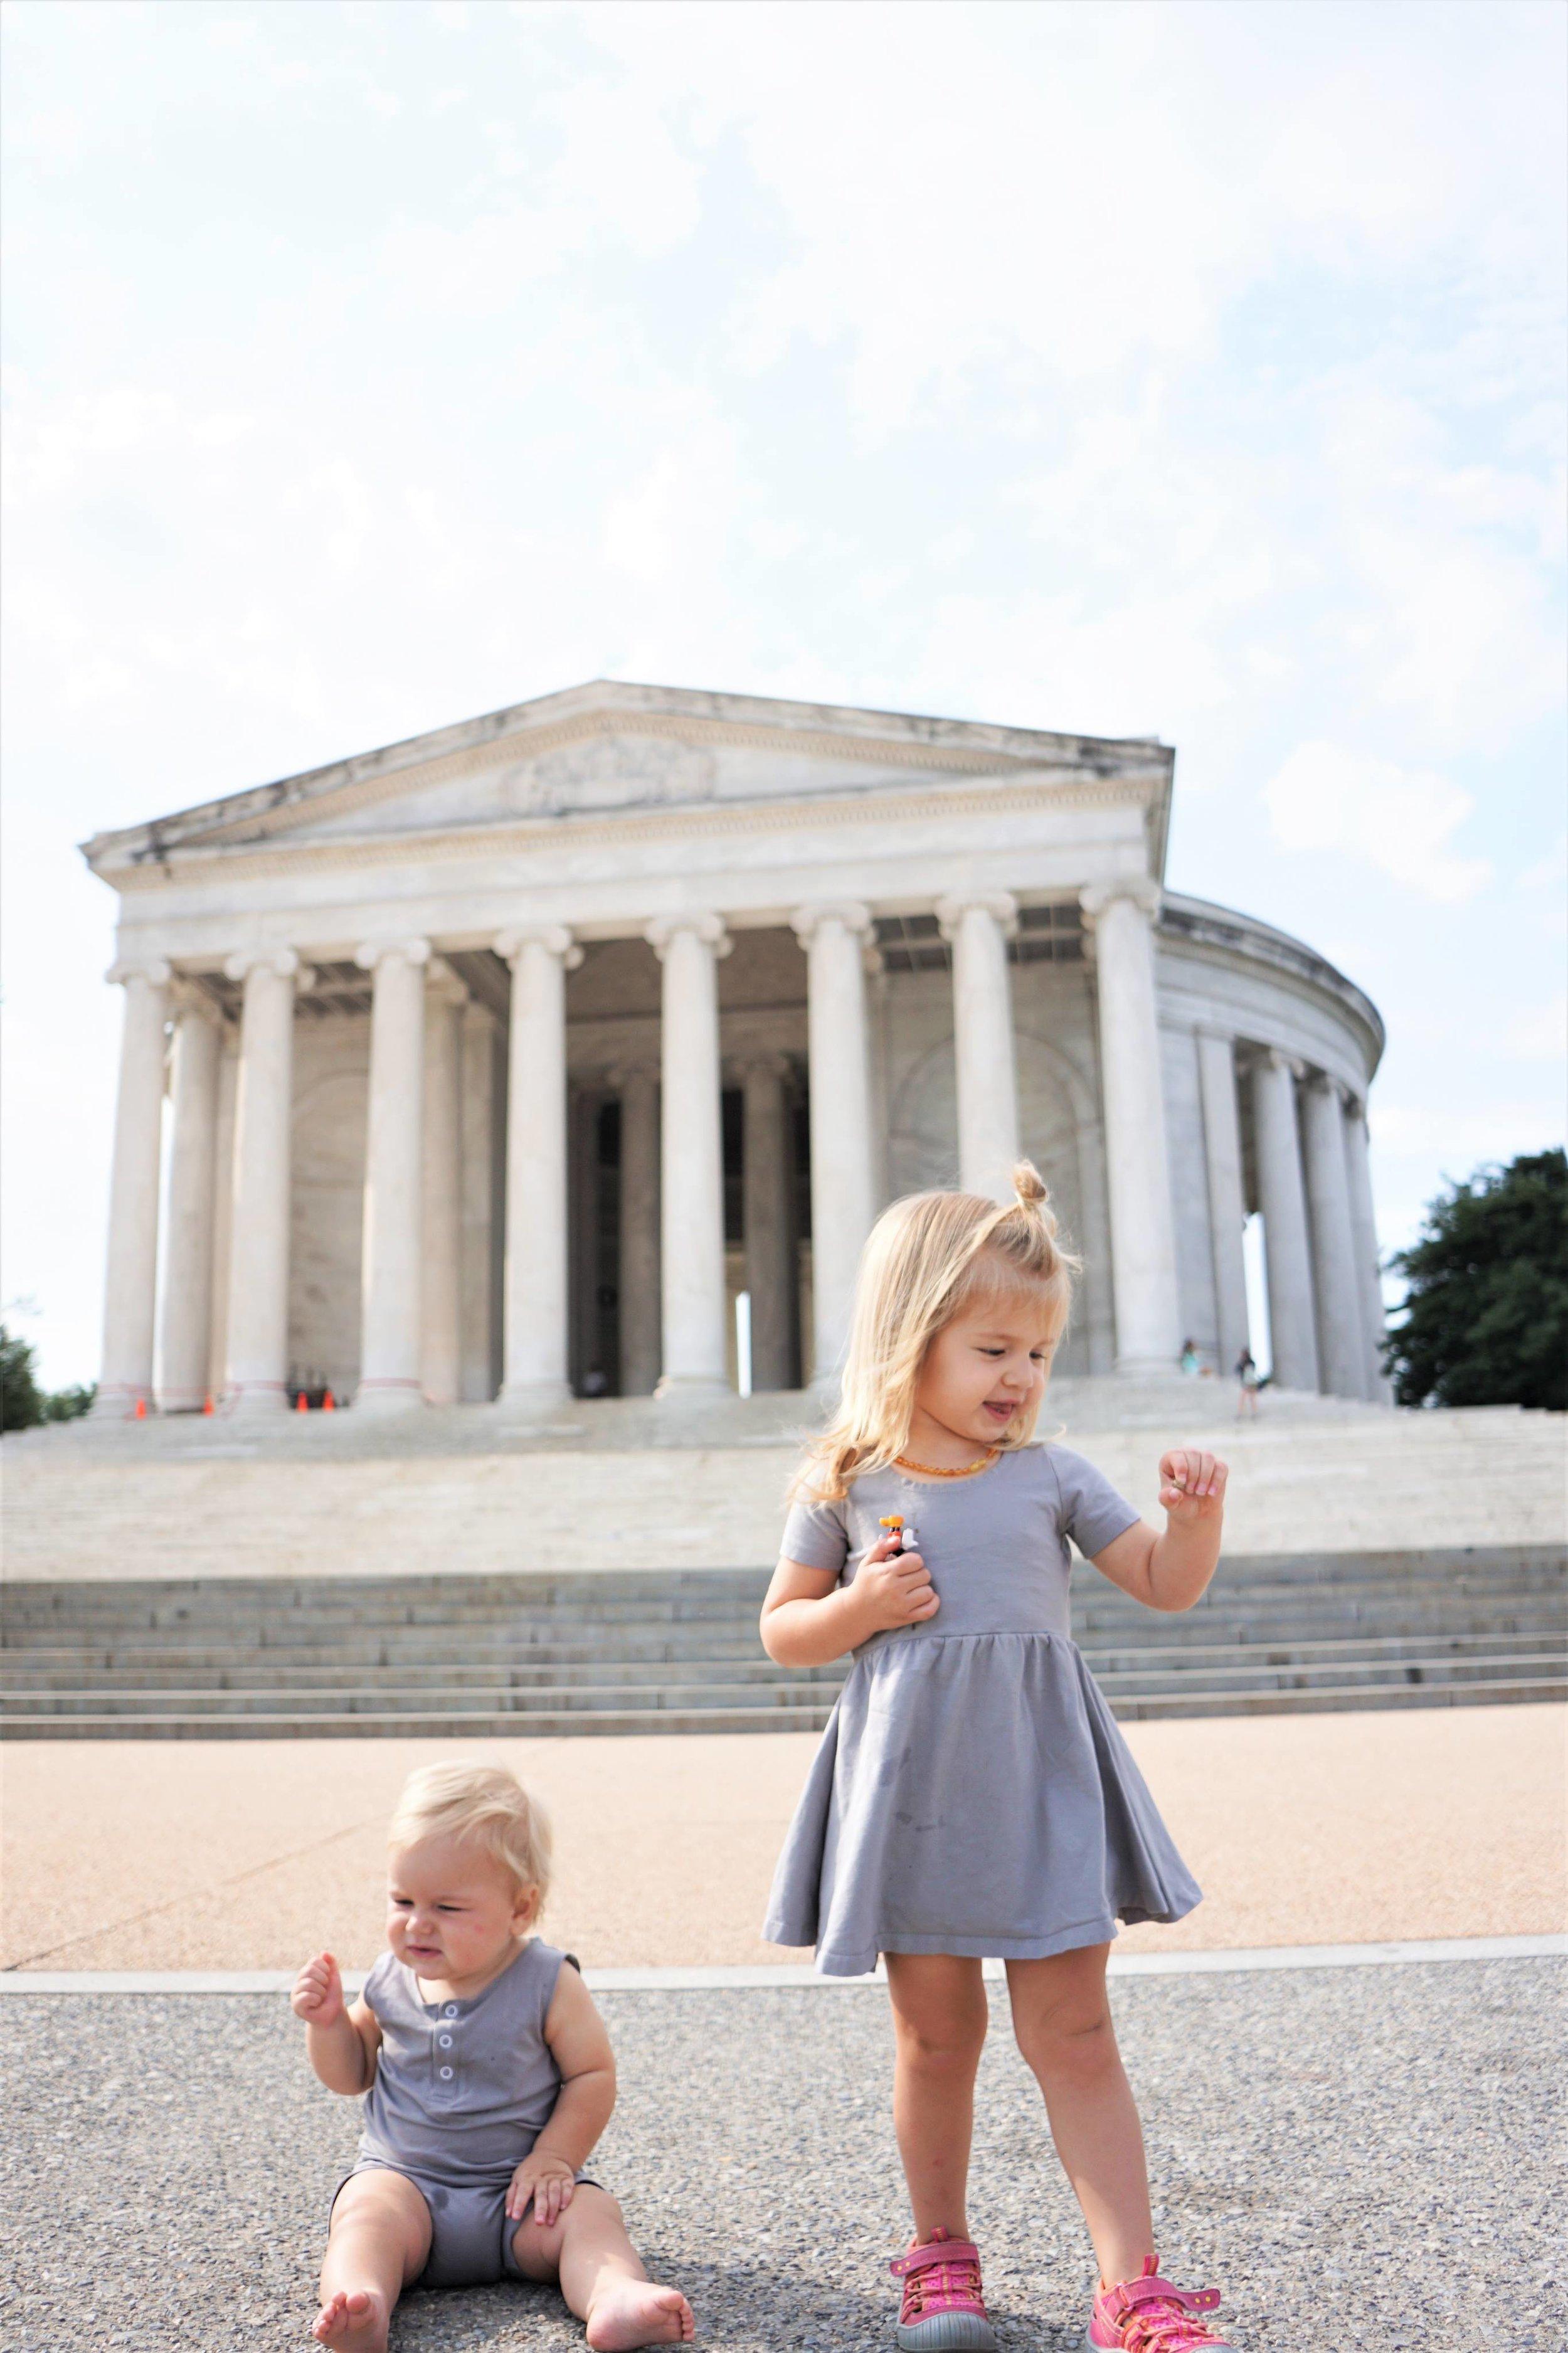 The Kids at the Thomas Jefferson Memorial